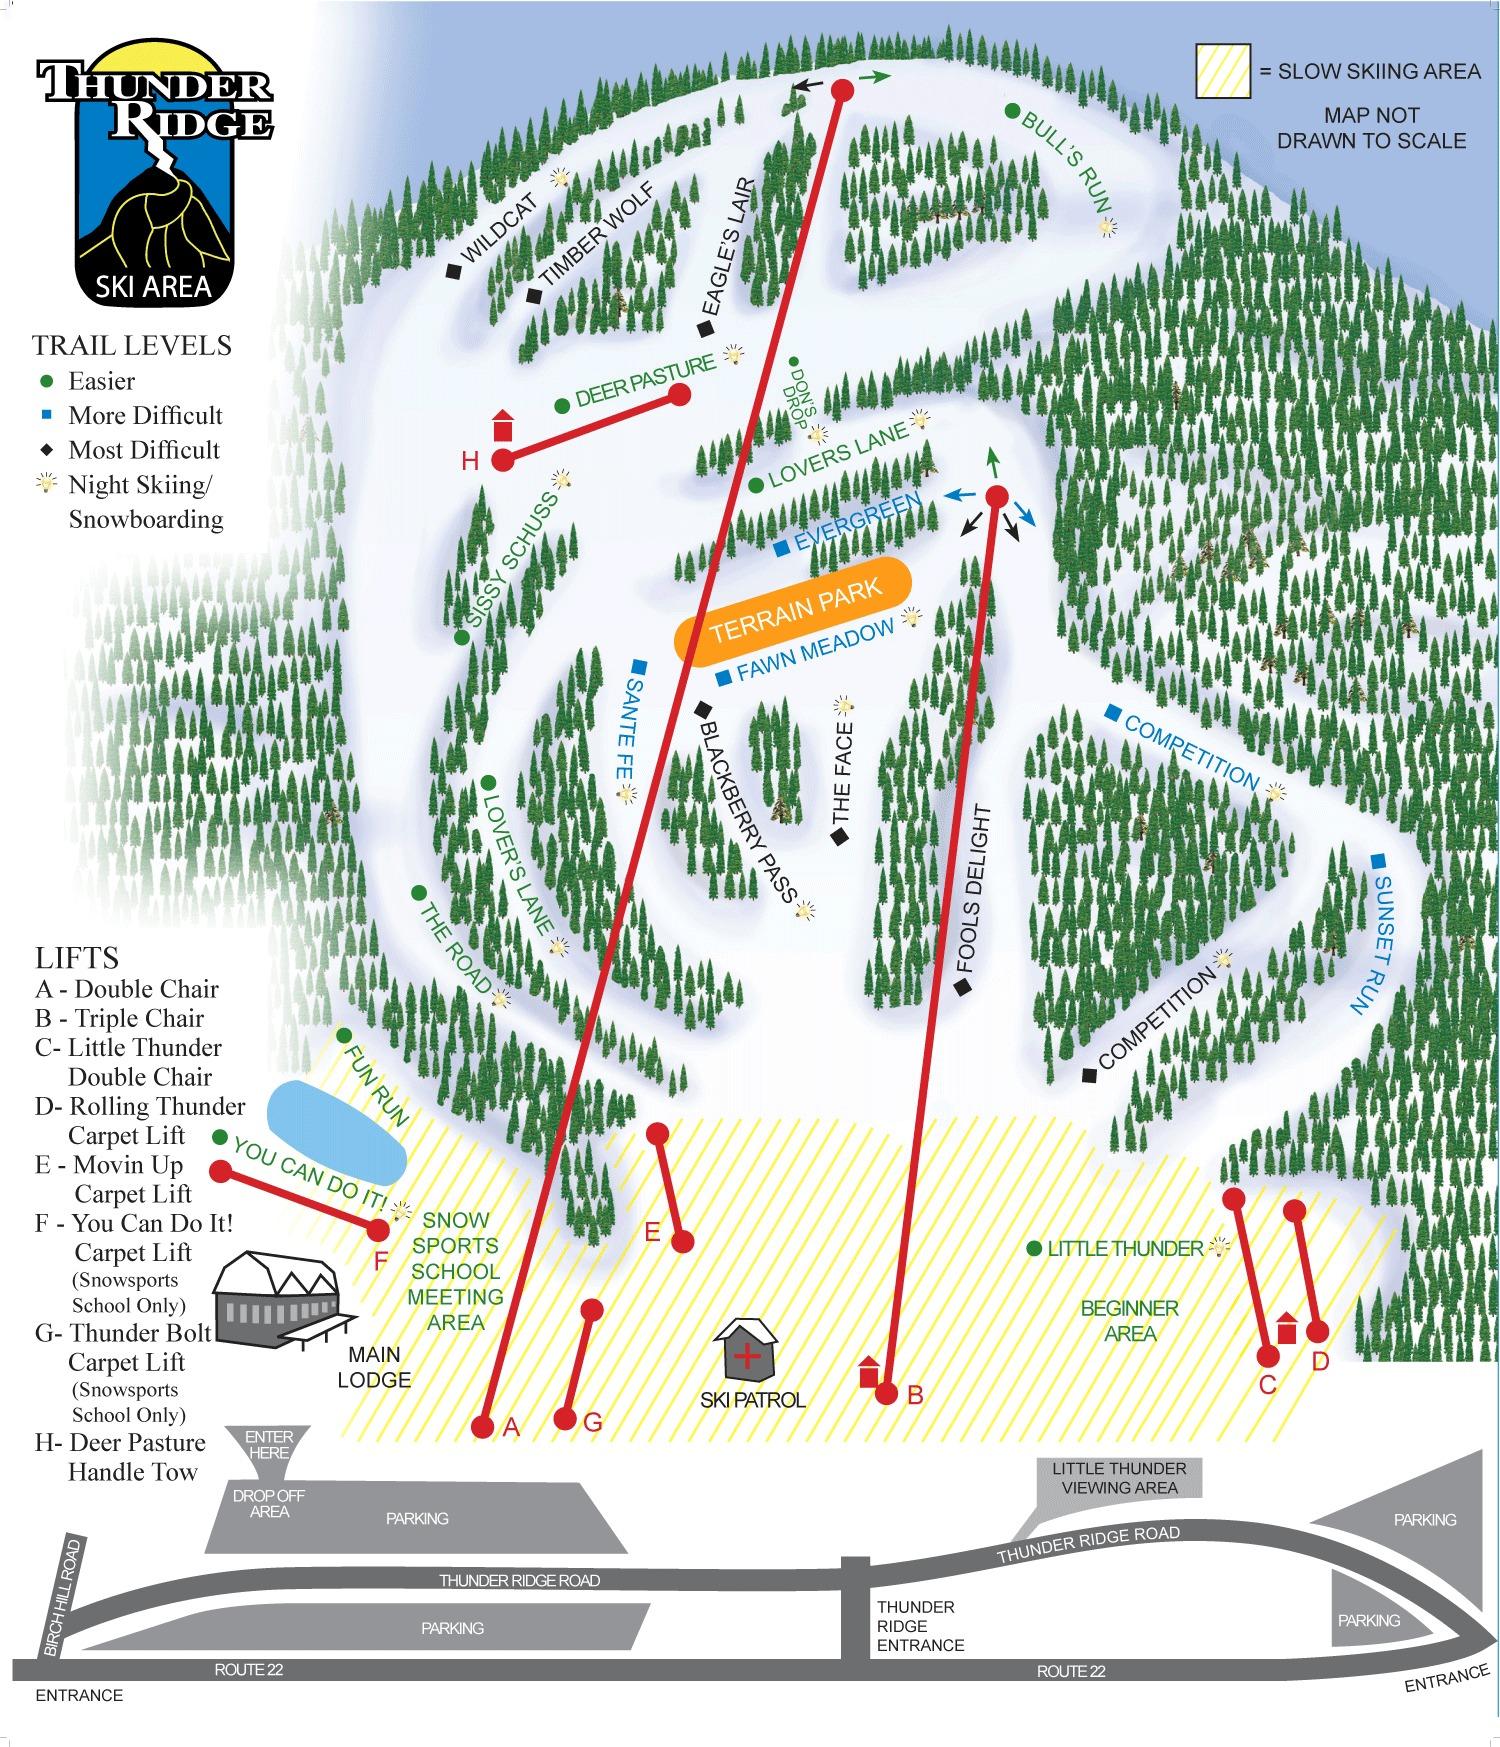 Thunder Ridge Piste / Trail Map